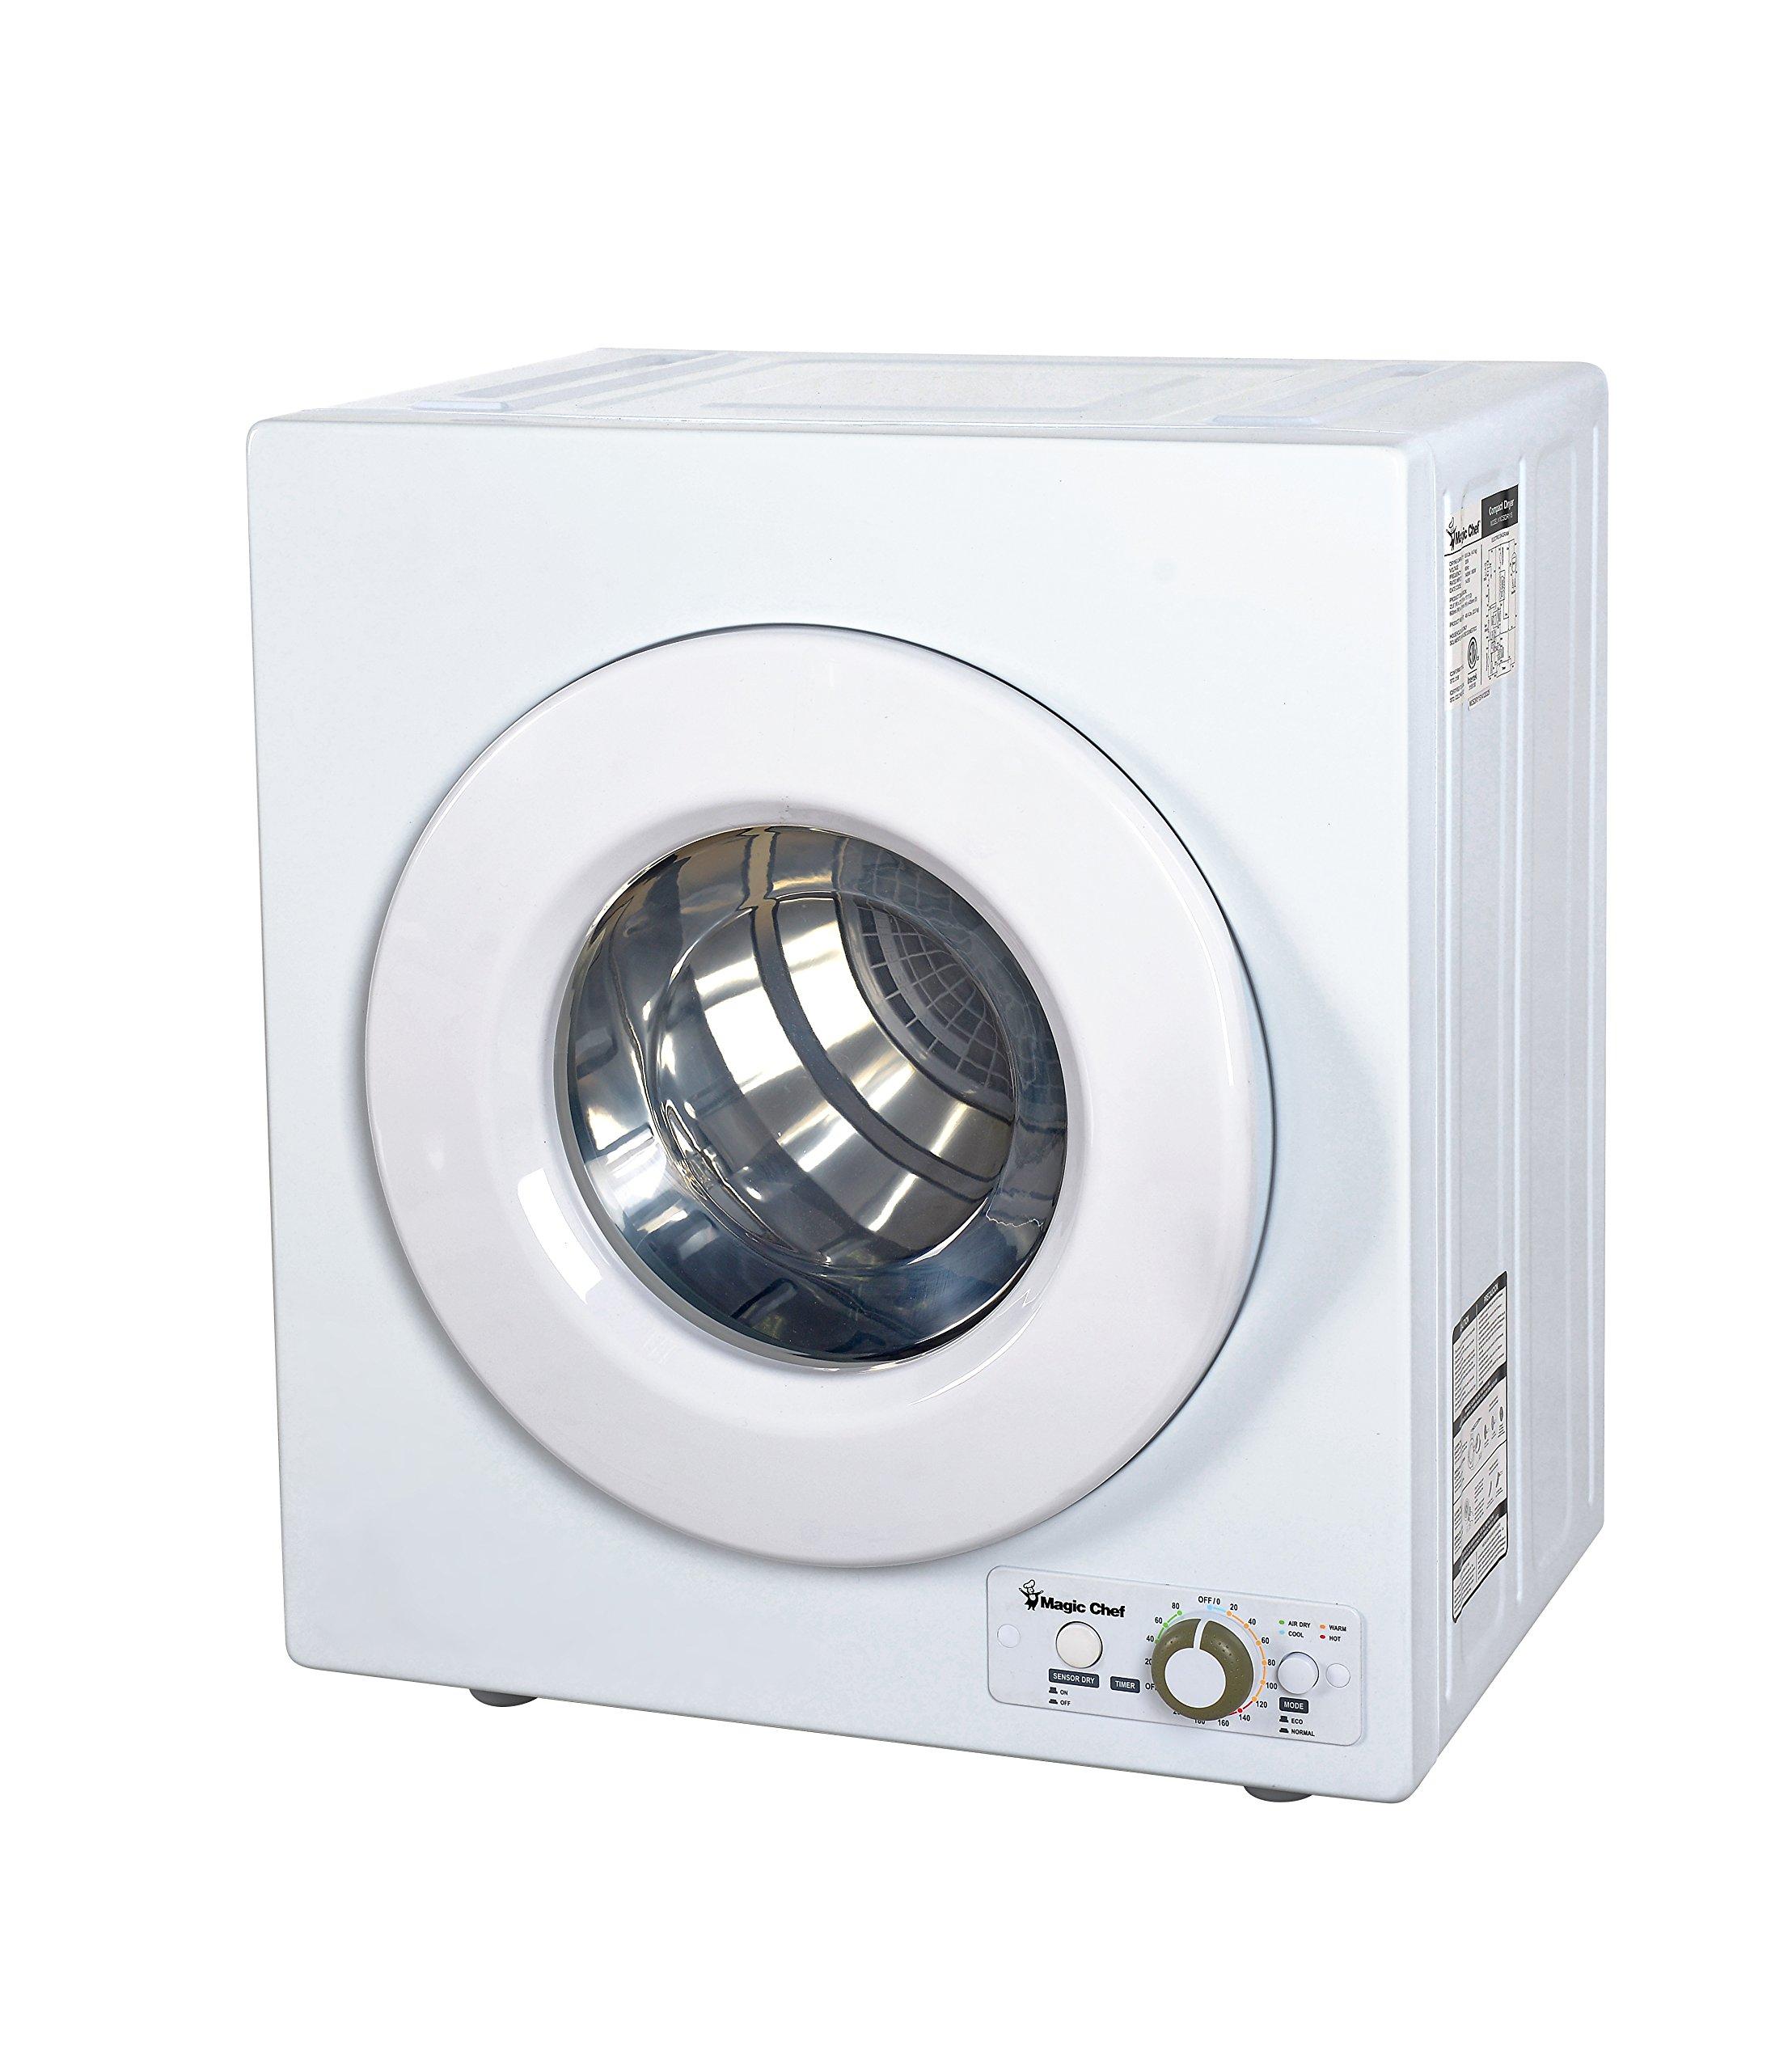 Magic Chef MCSDRY1S Laundry Dryer